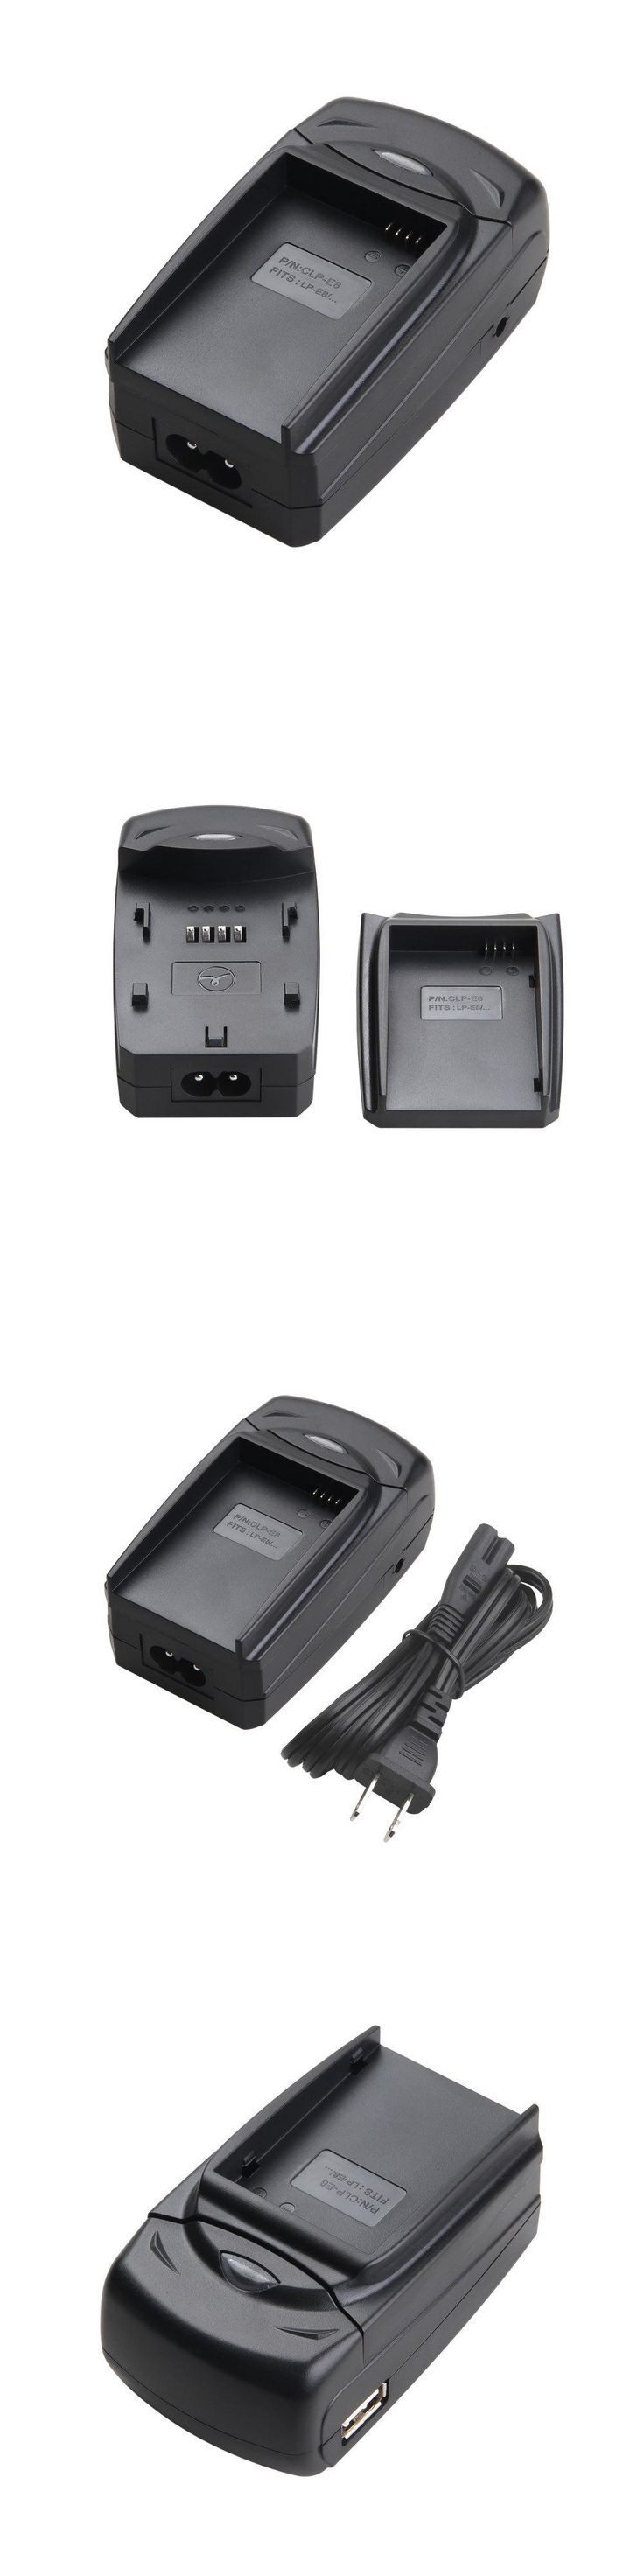 25+ unique Universal battery charger ideas on Pinterest ...